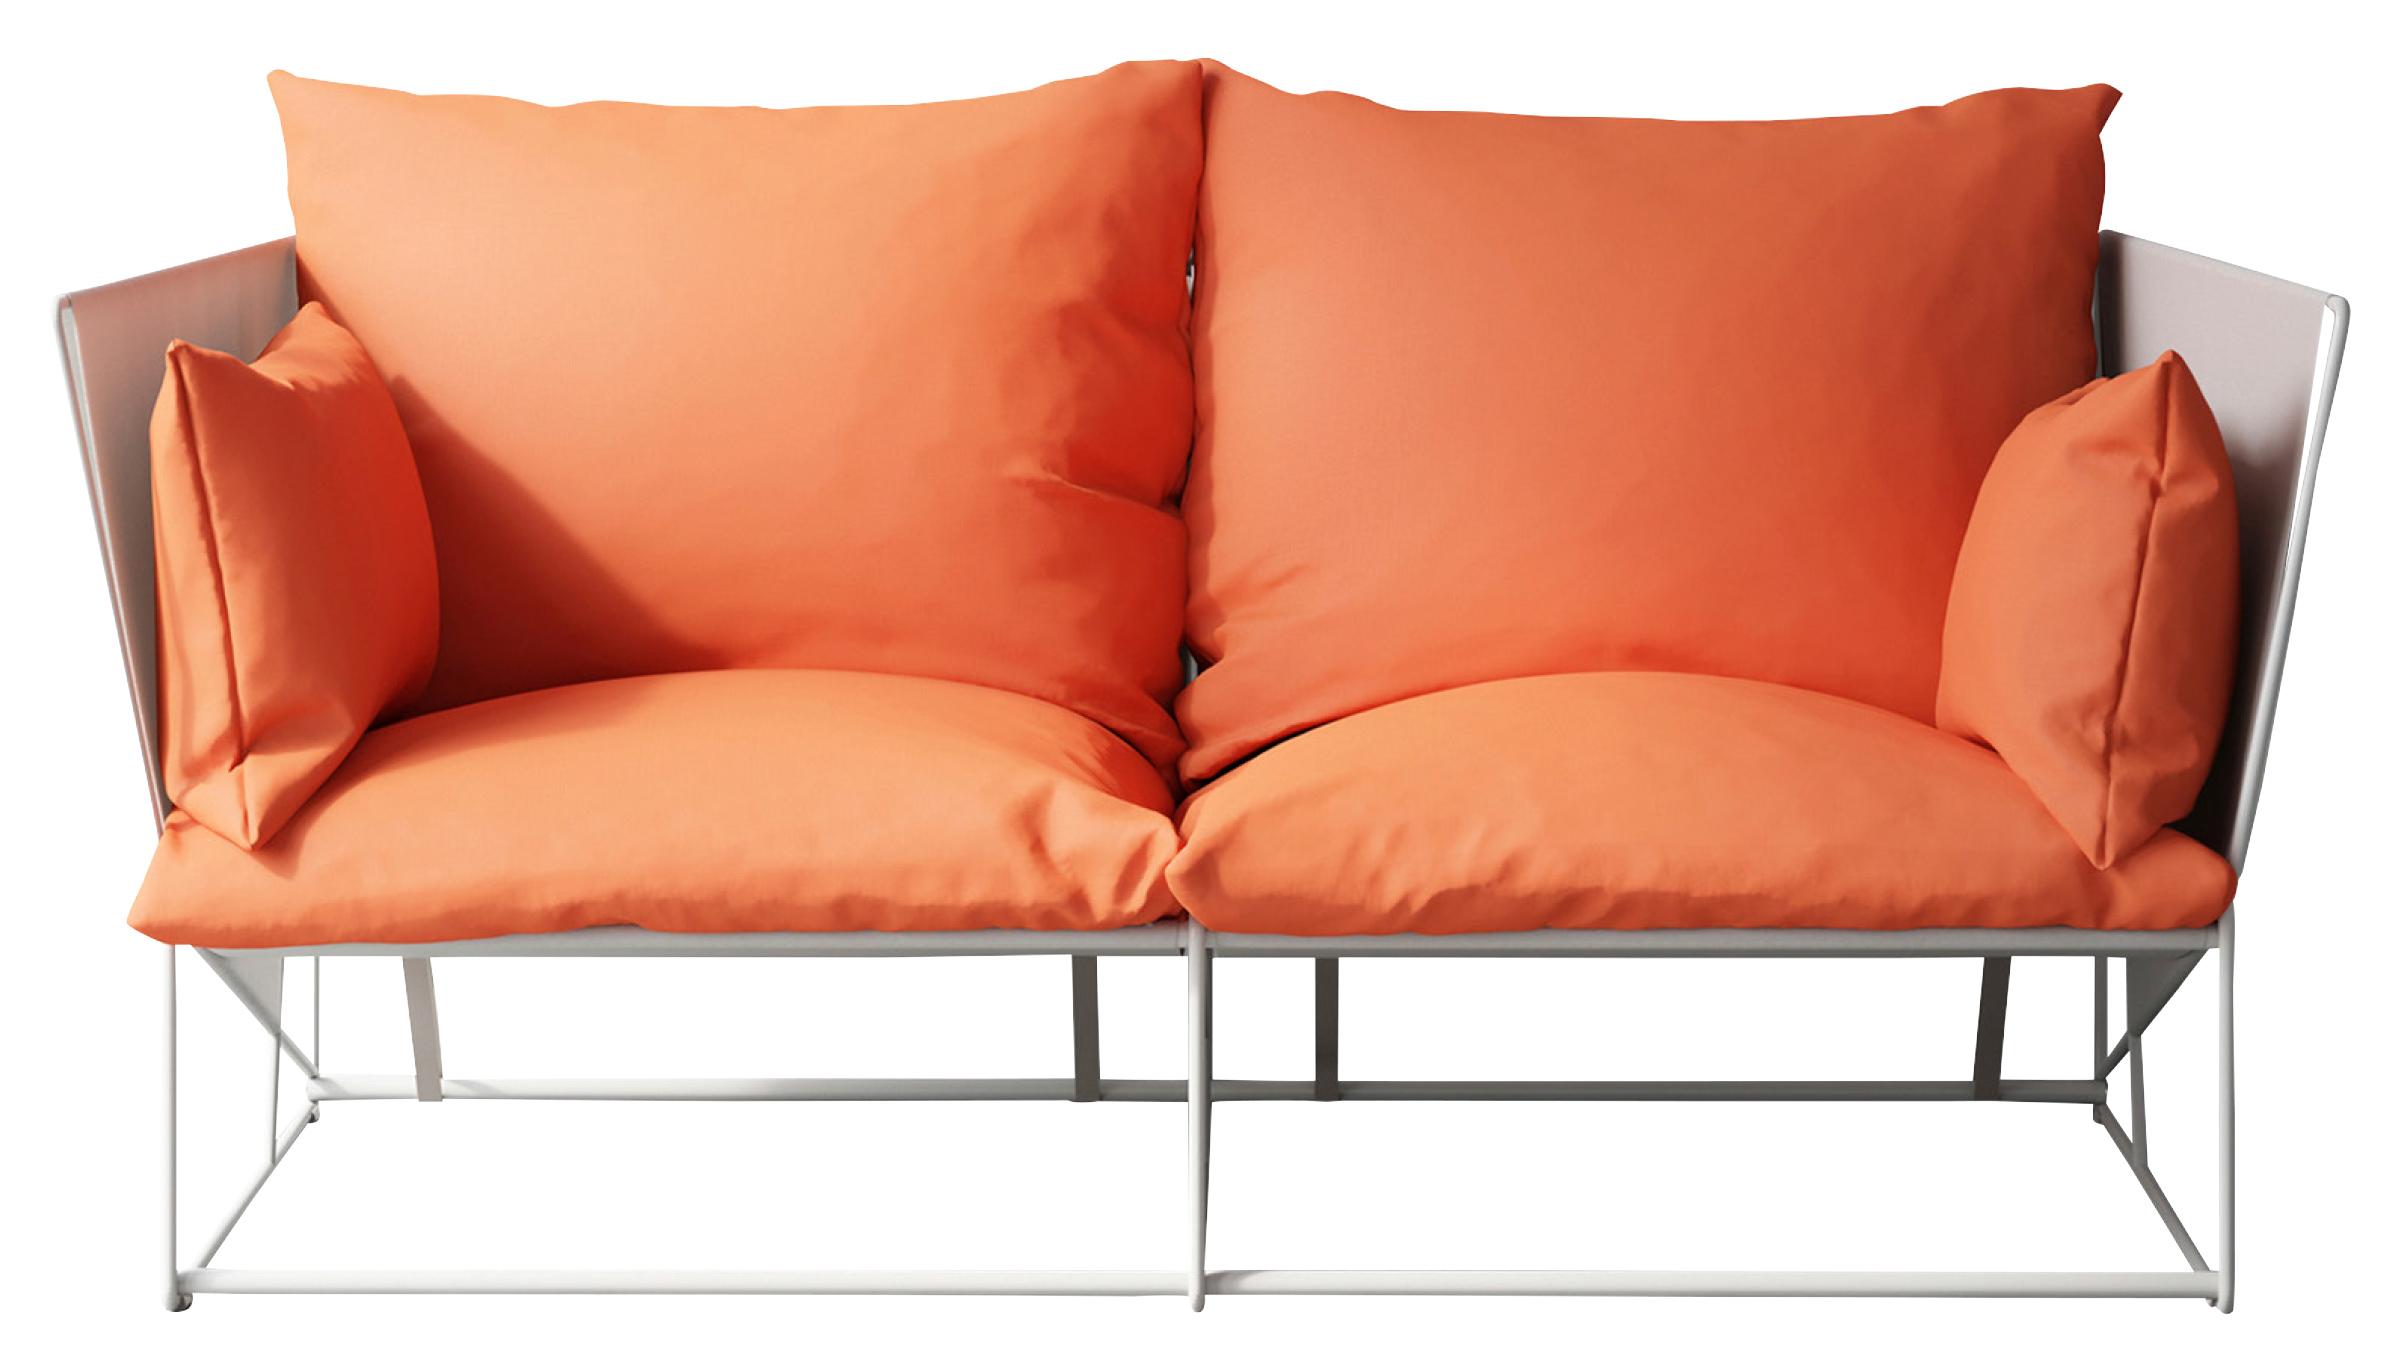 Ikea Design Through The Years